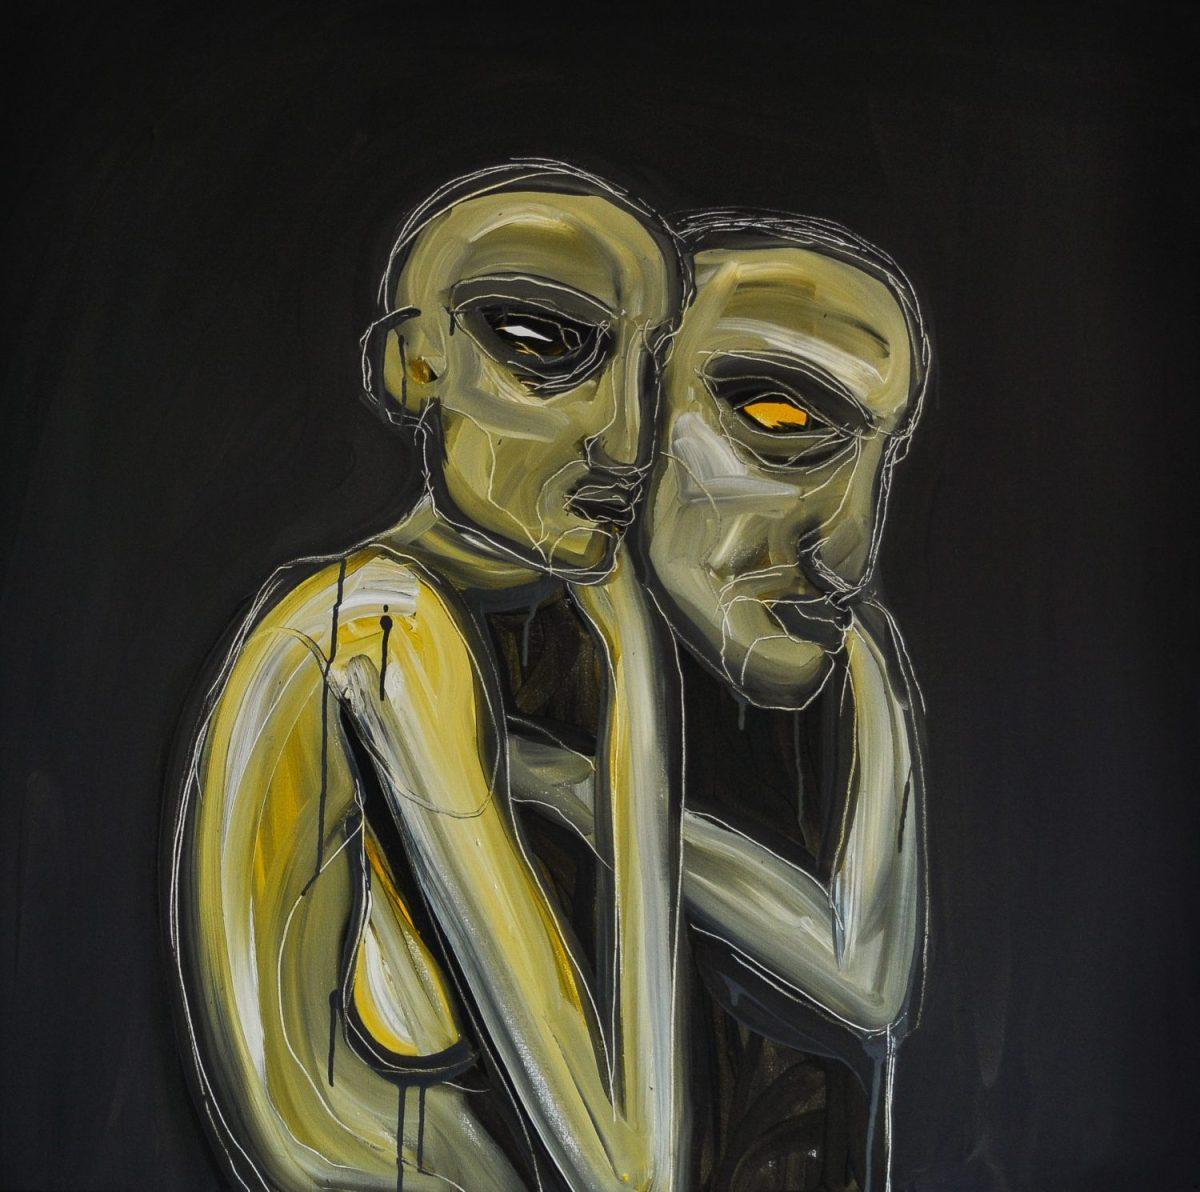 Rasmus Højfeldt, Conceptual Romance, 2017